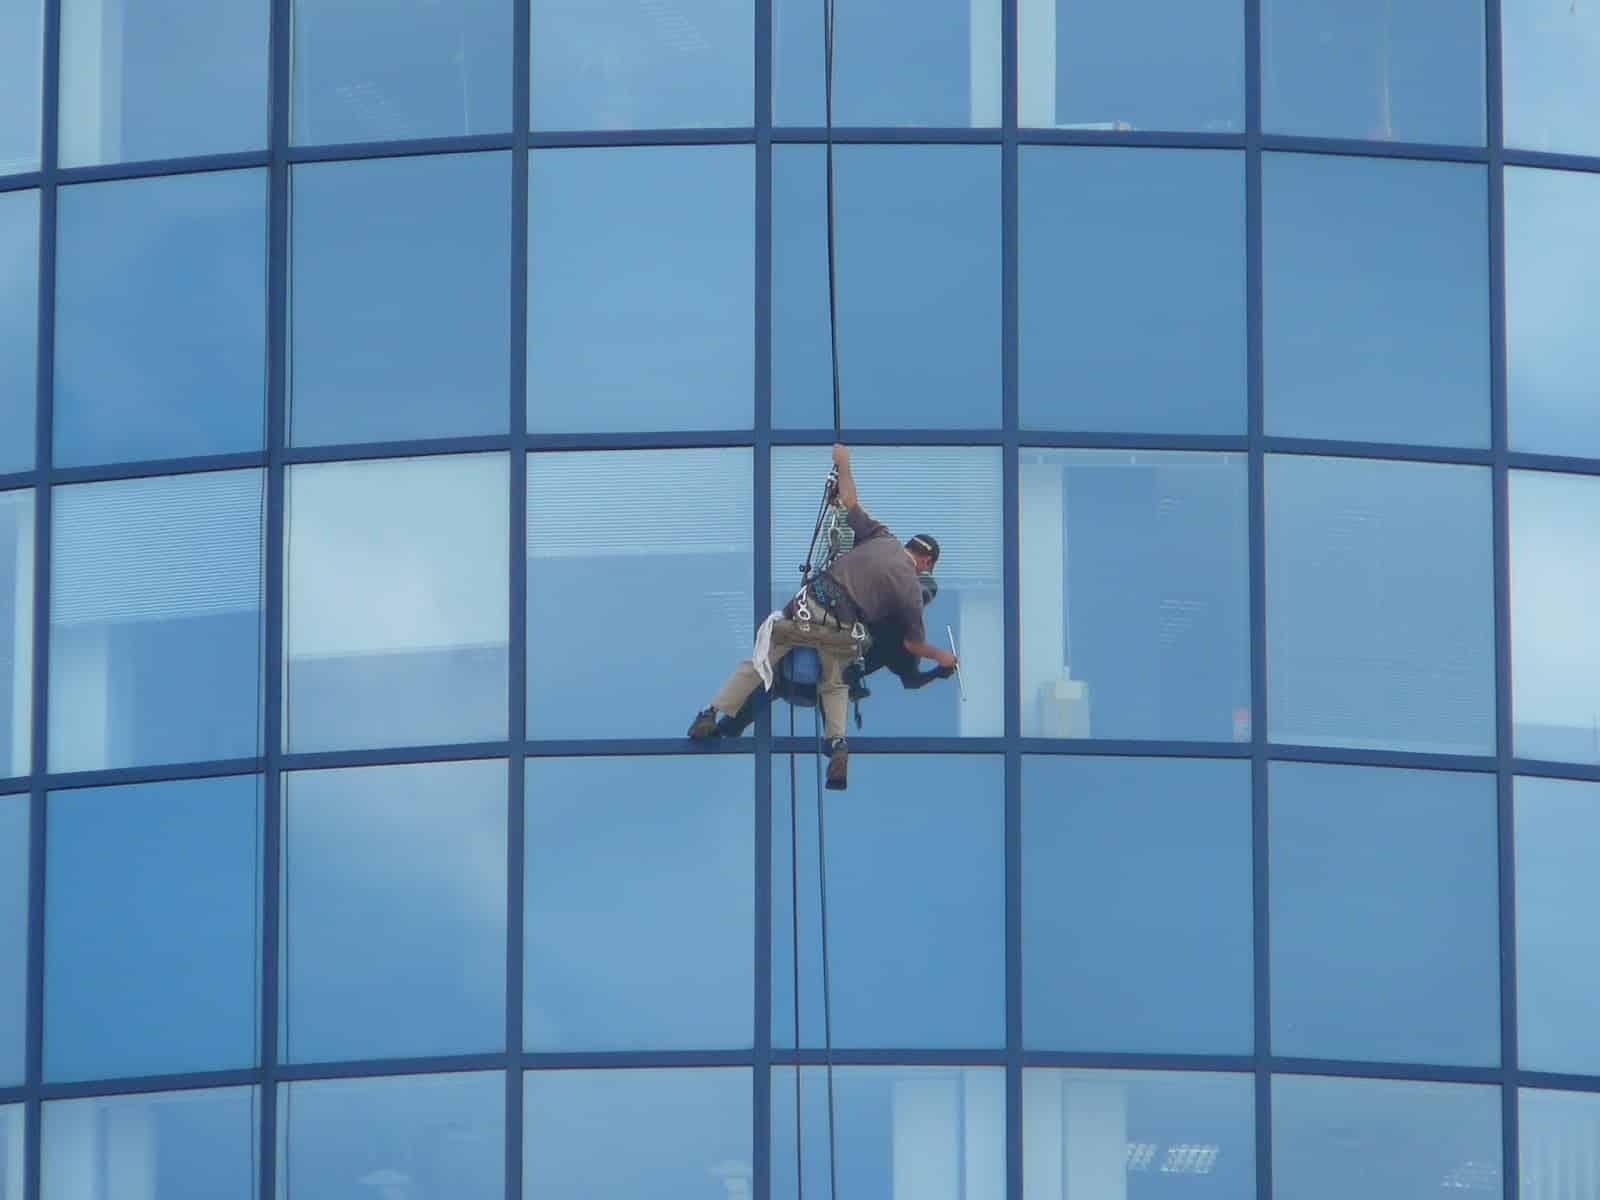 شركة تنظيف واجهات زجاج بابها 0550362055